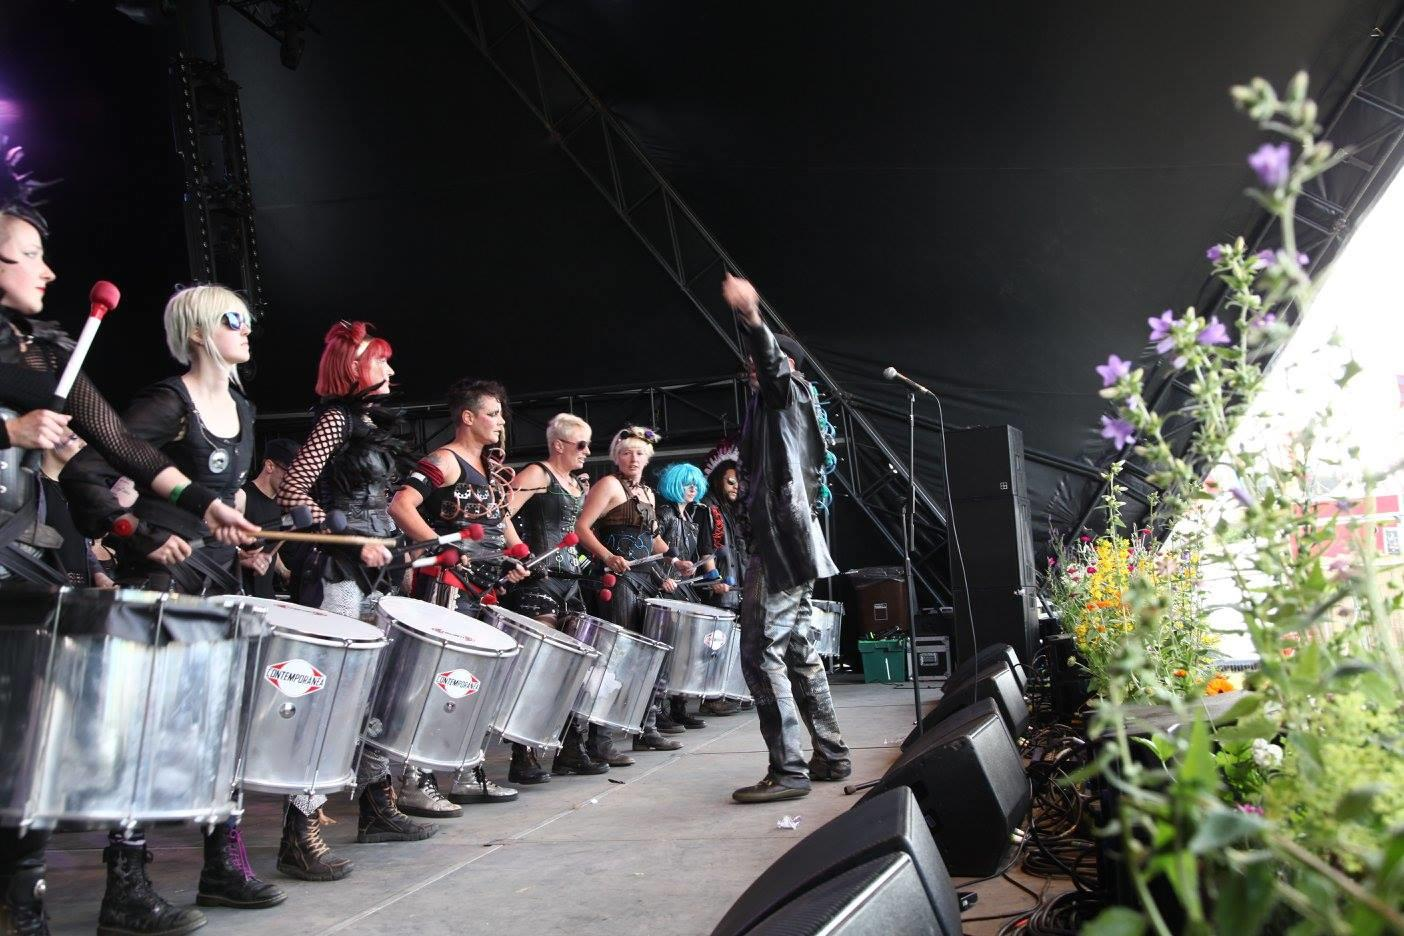 hebden bridge drum machine WI event